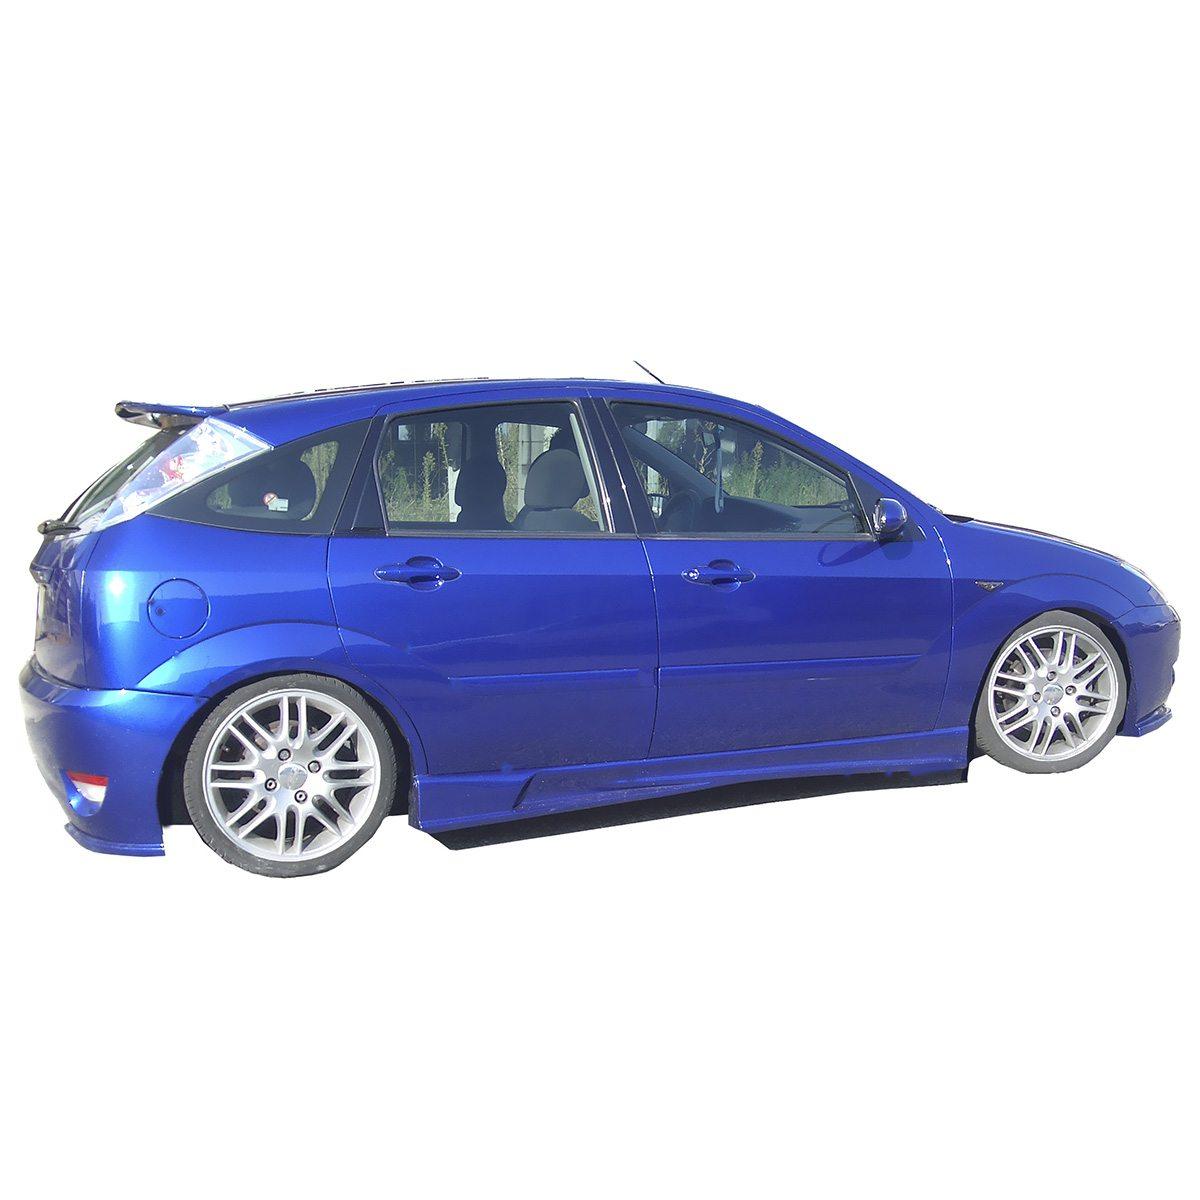 Ford-Focus-Sniper-Emb-EBU0101